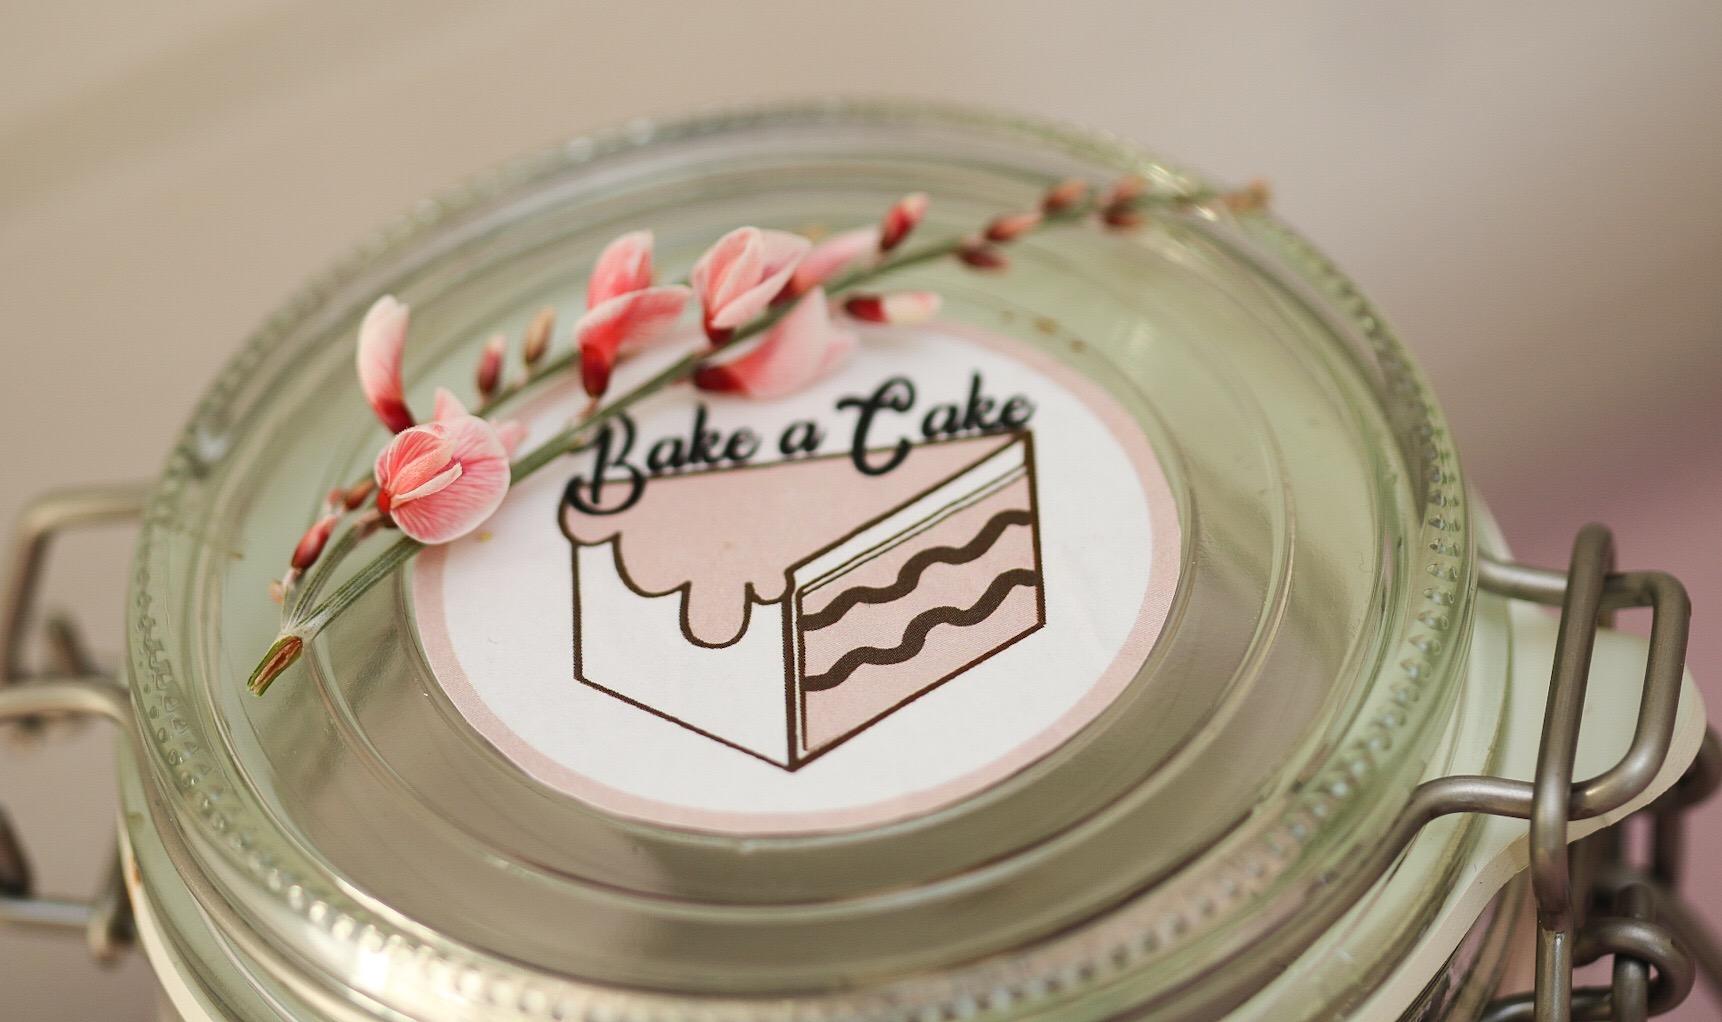 Bake a Cake UF